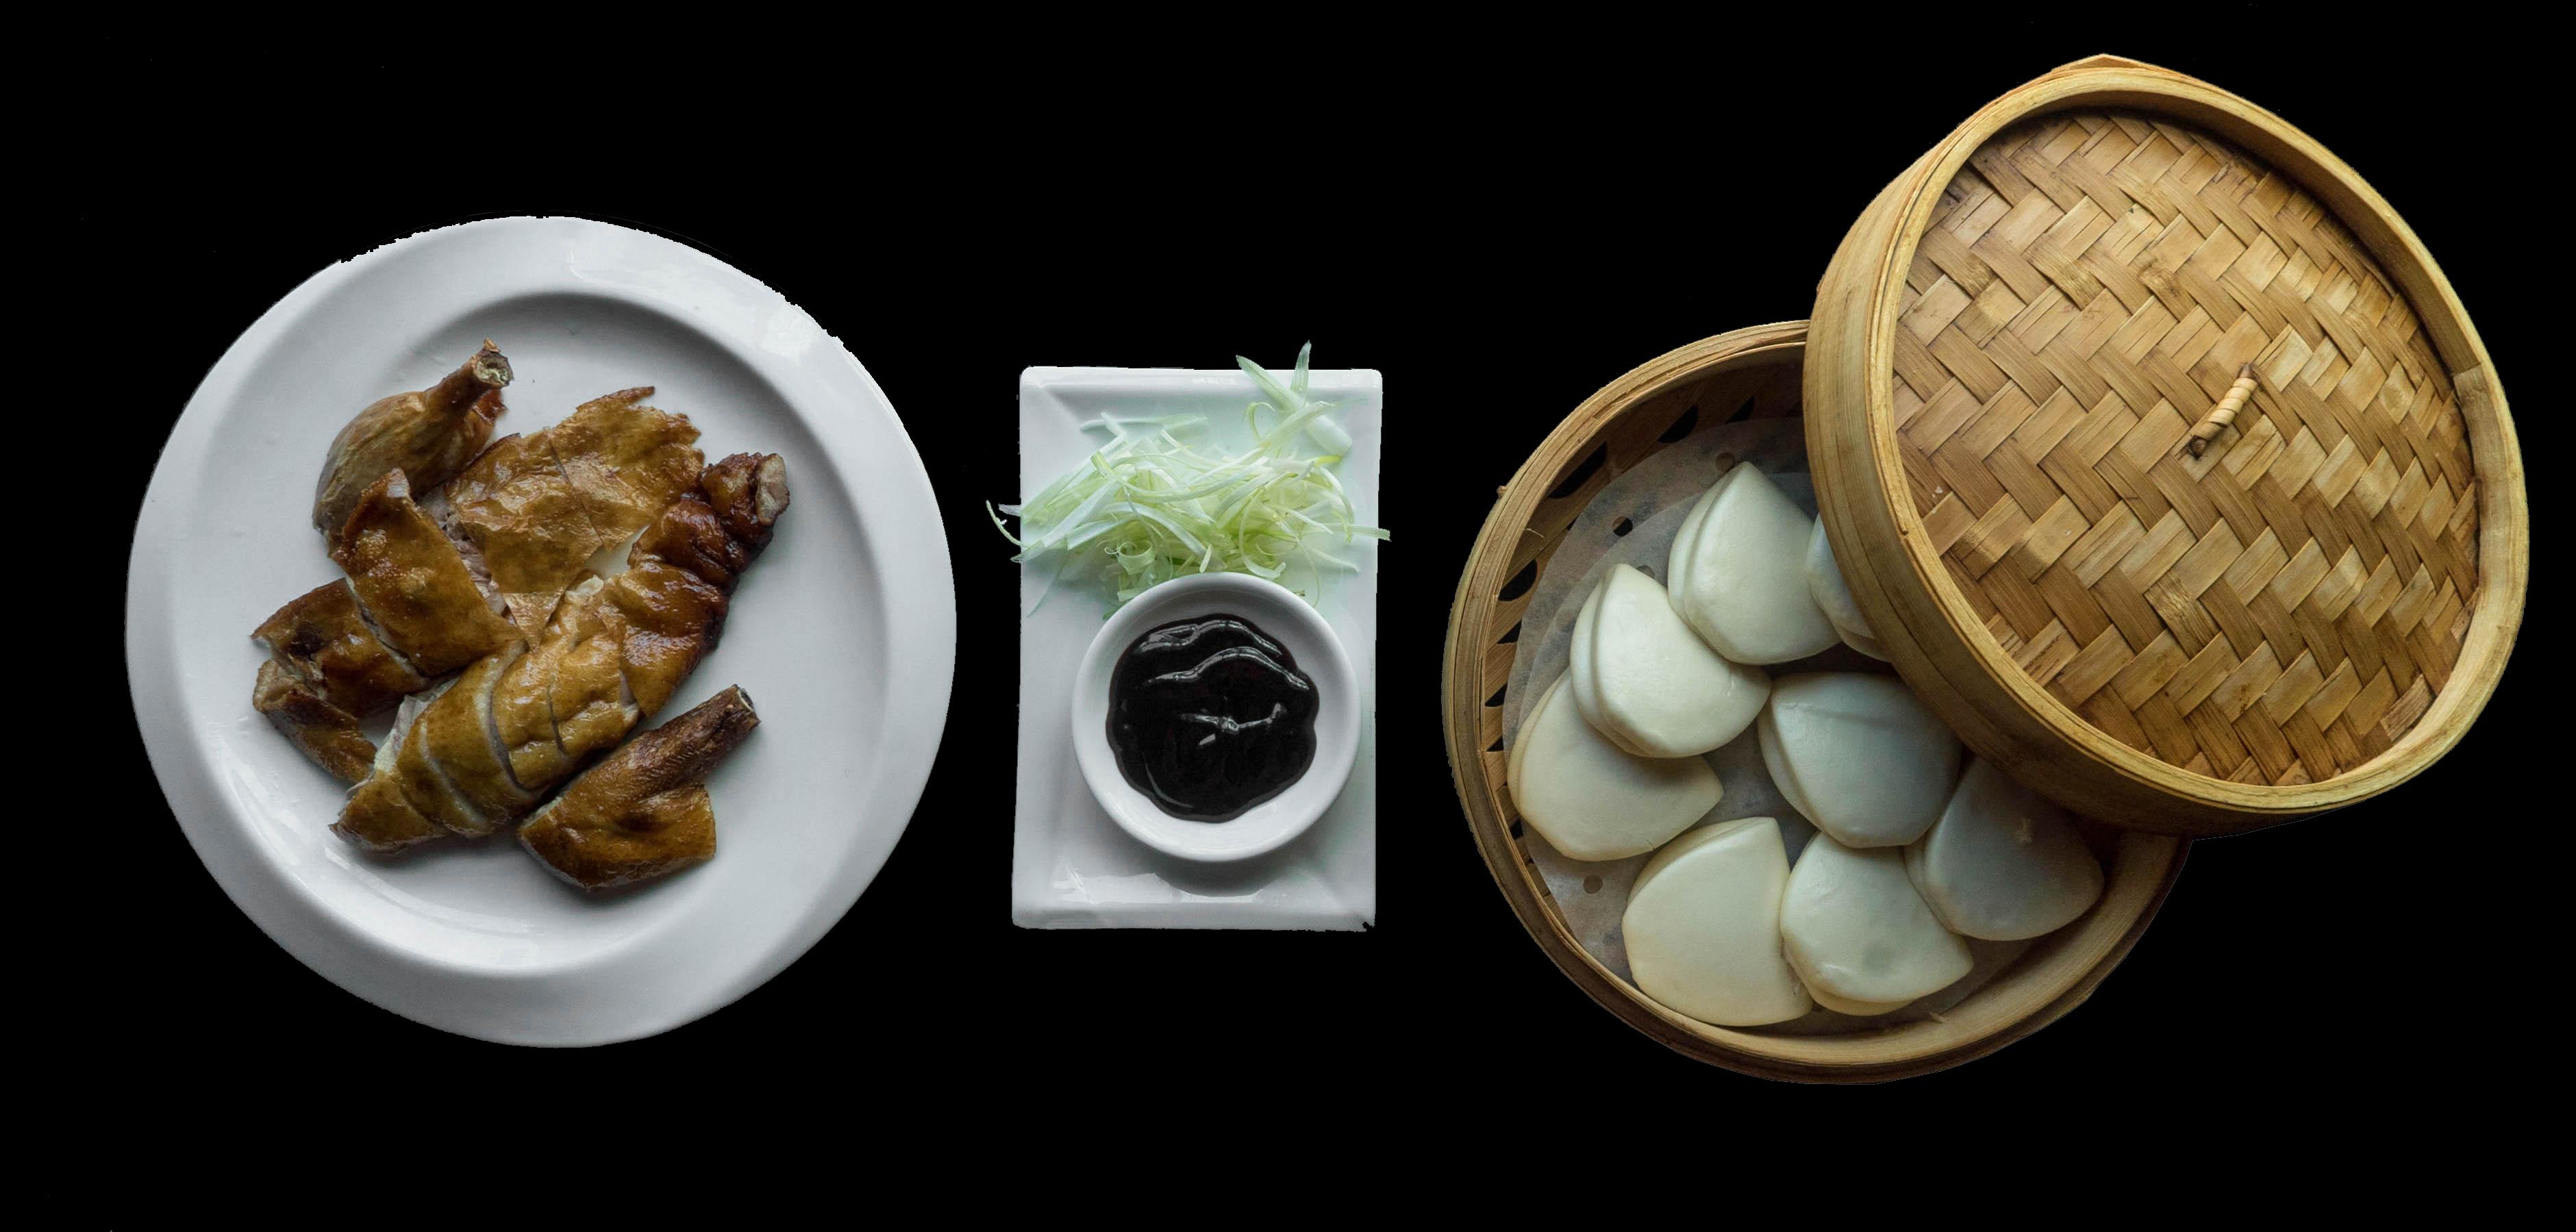 51. 京都片皮鸭 Peking Duck Image